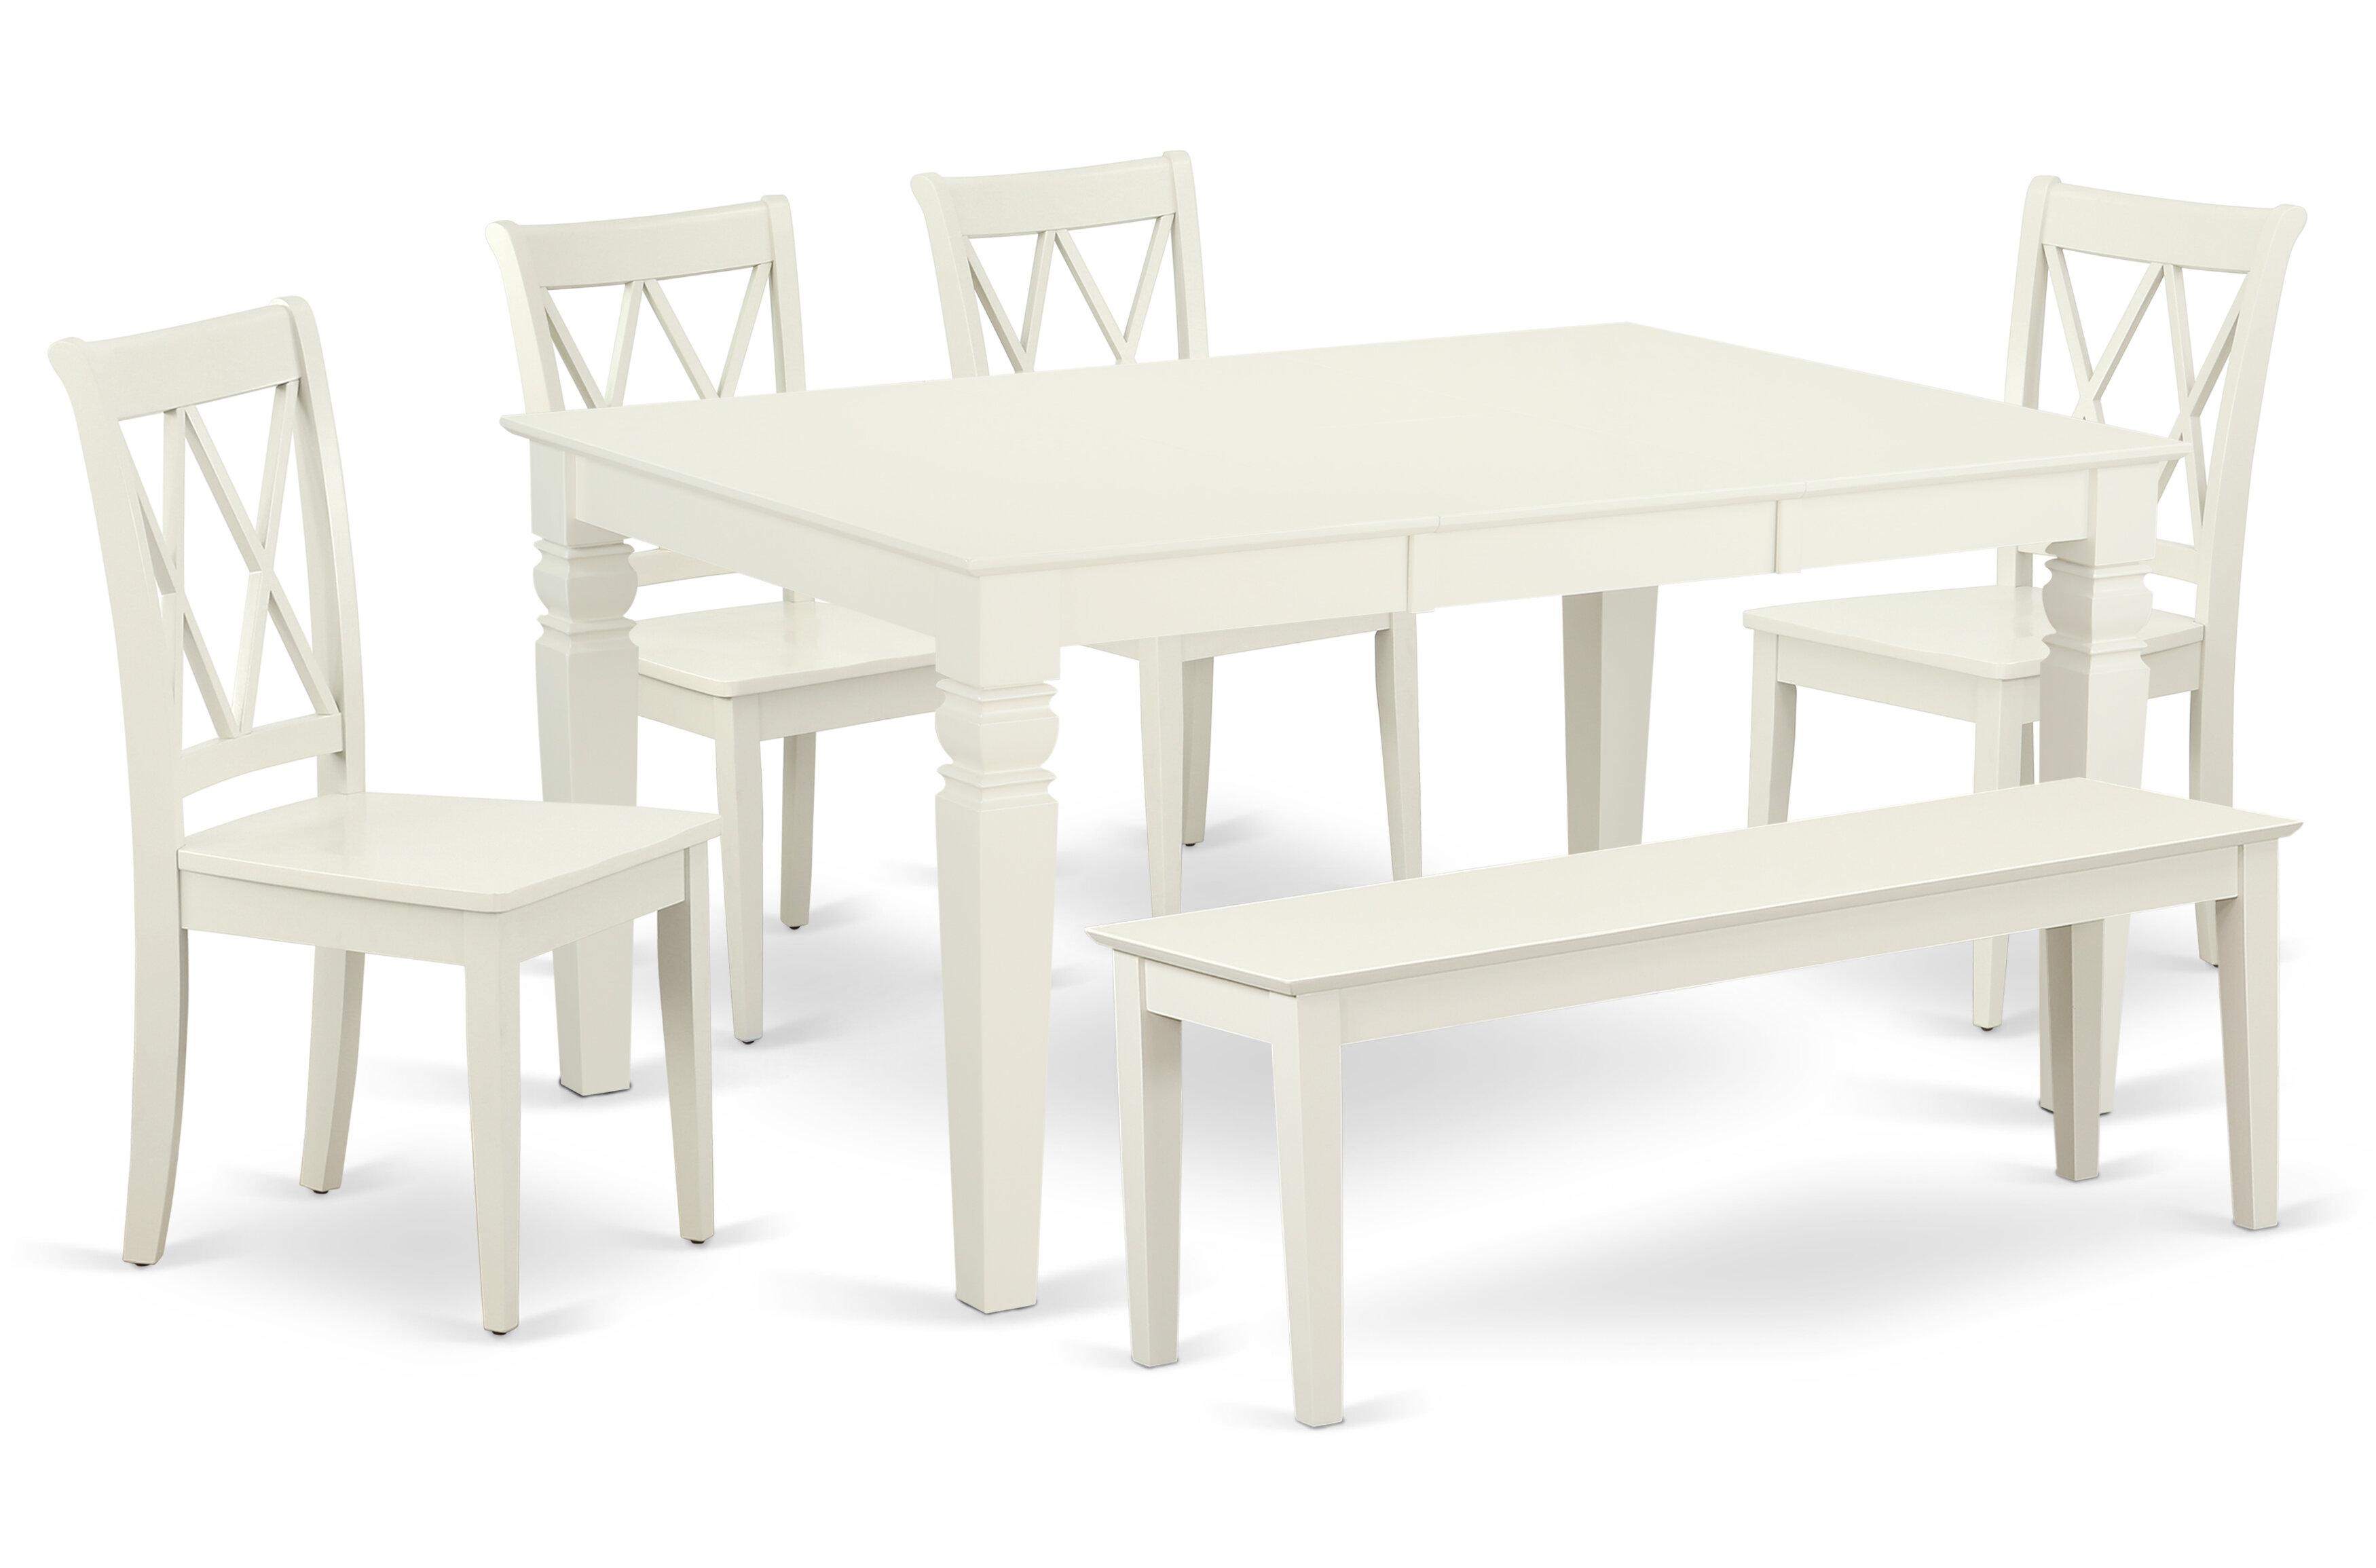 Kulas 6 Piece Extendable Solid Wood Breakfast Nook Dining Set